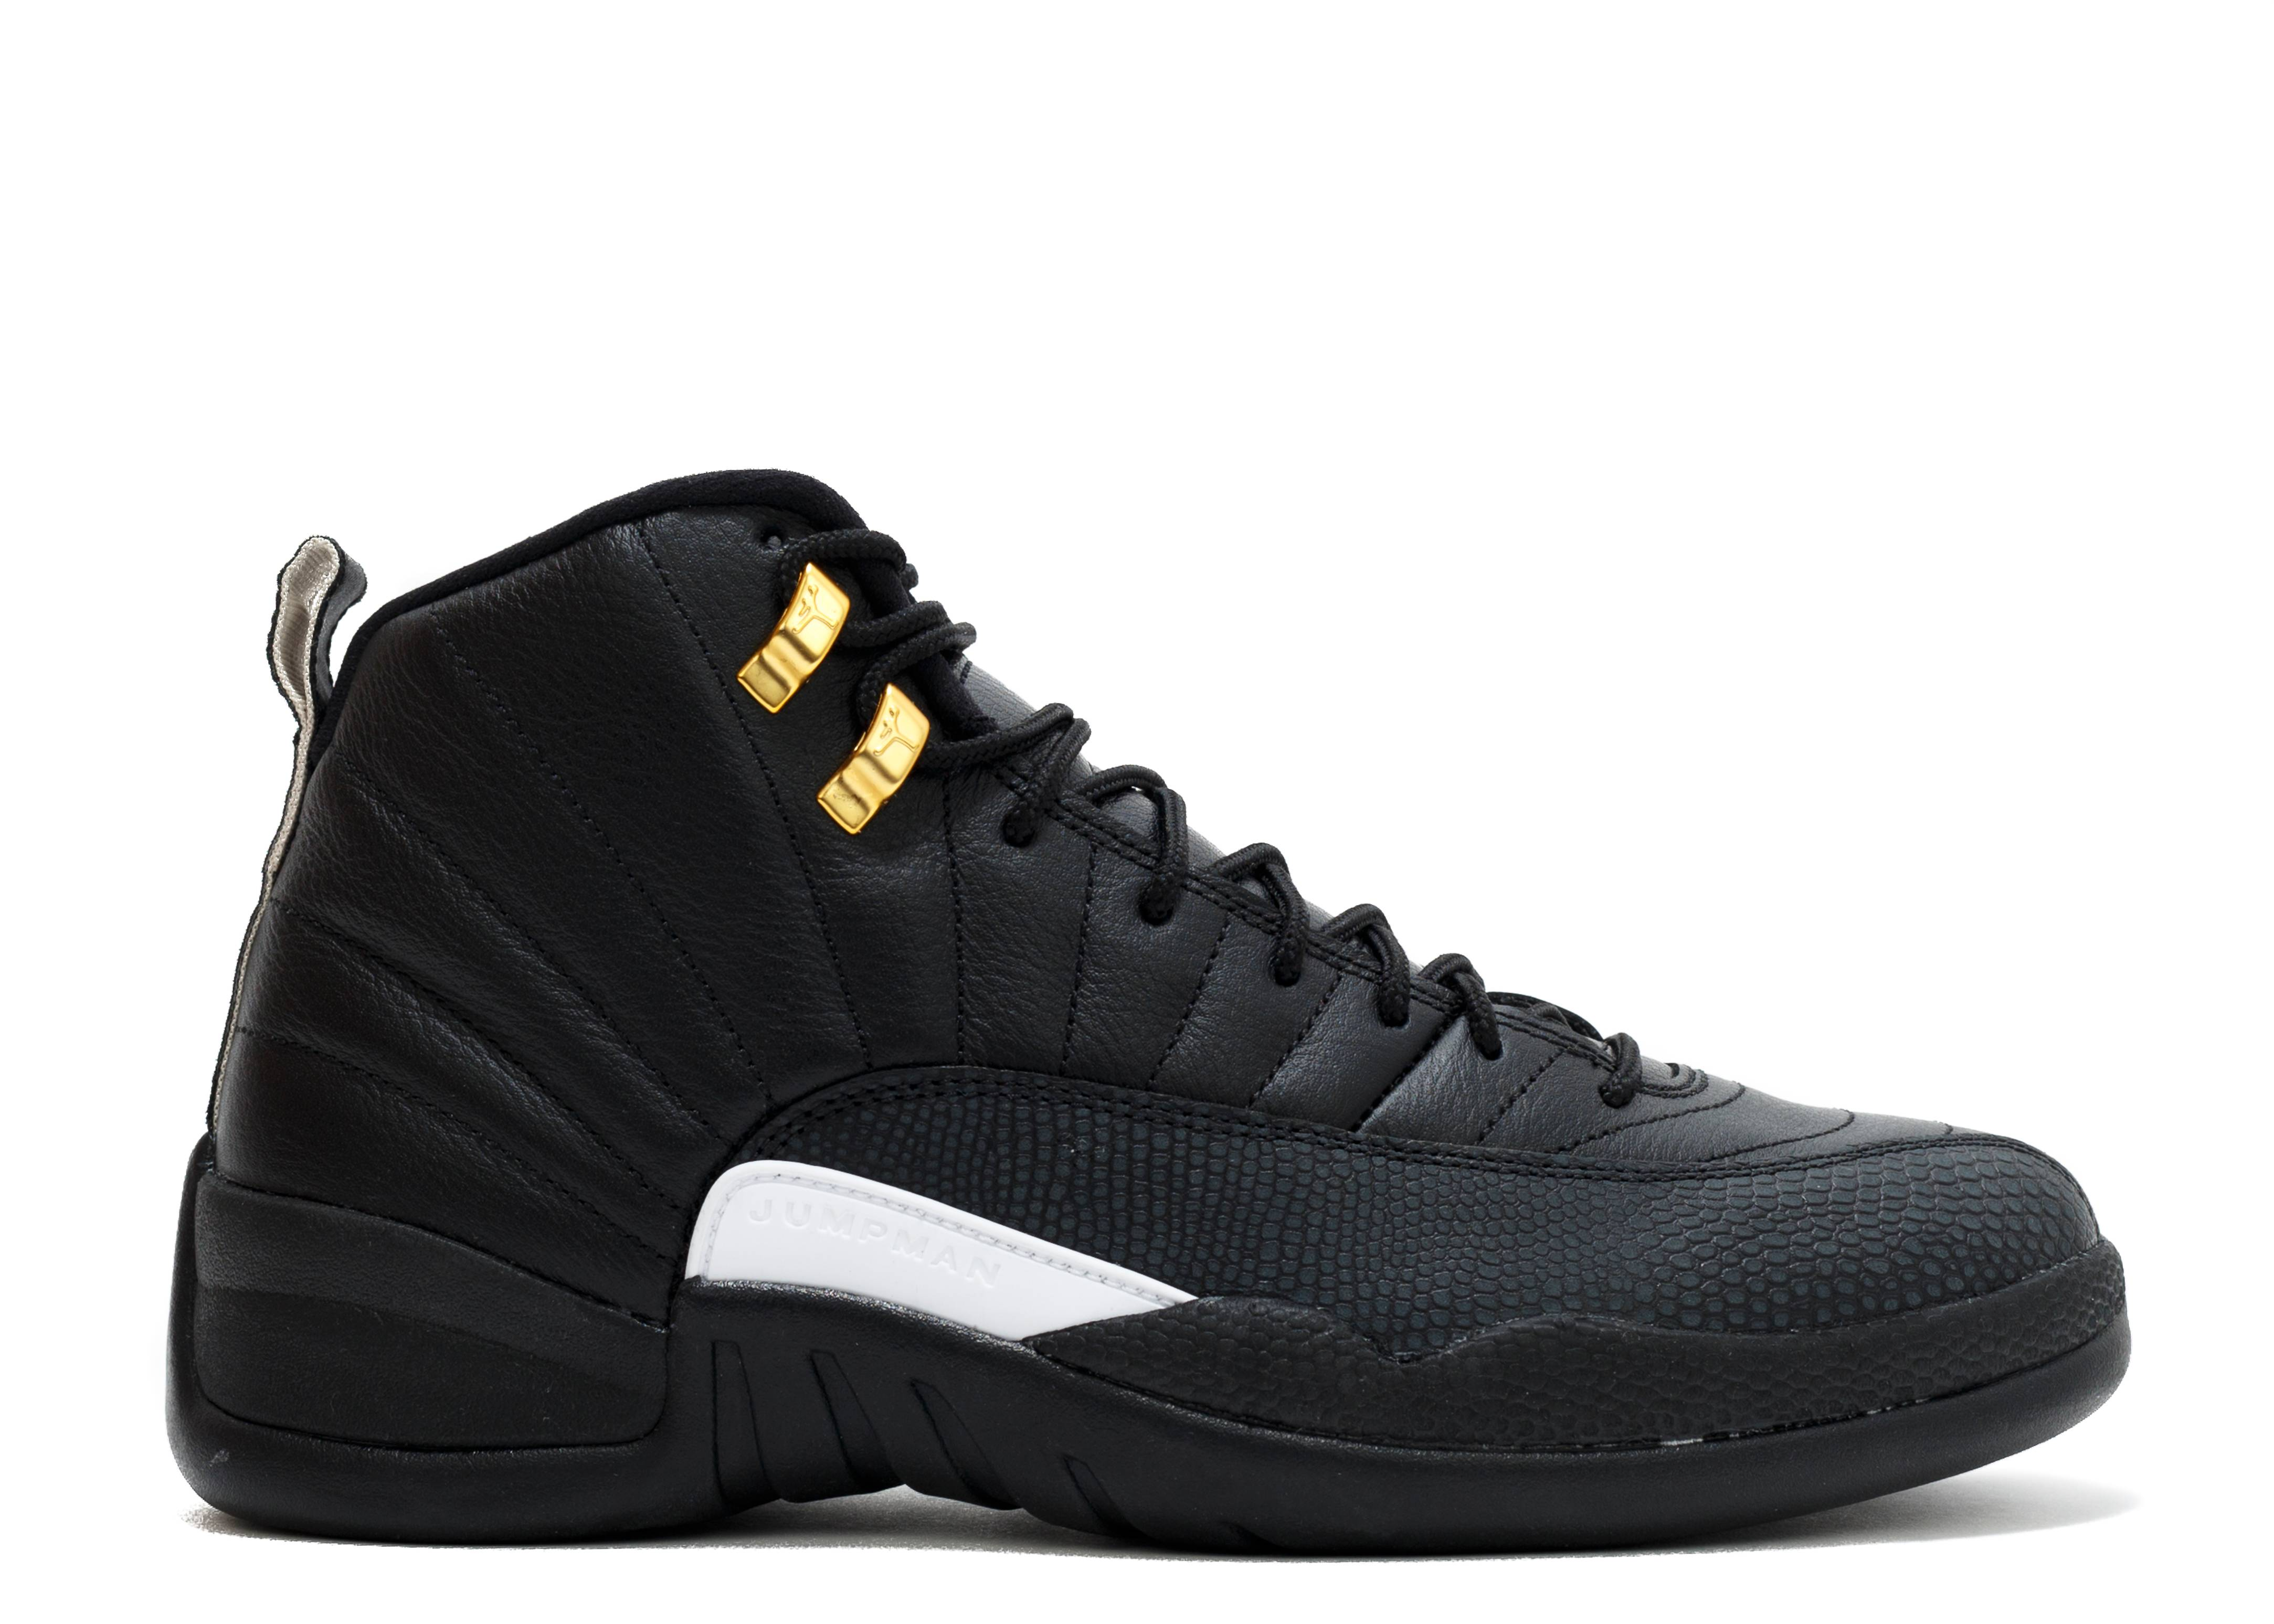 Nike Air Jordan 12 Retro The Master